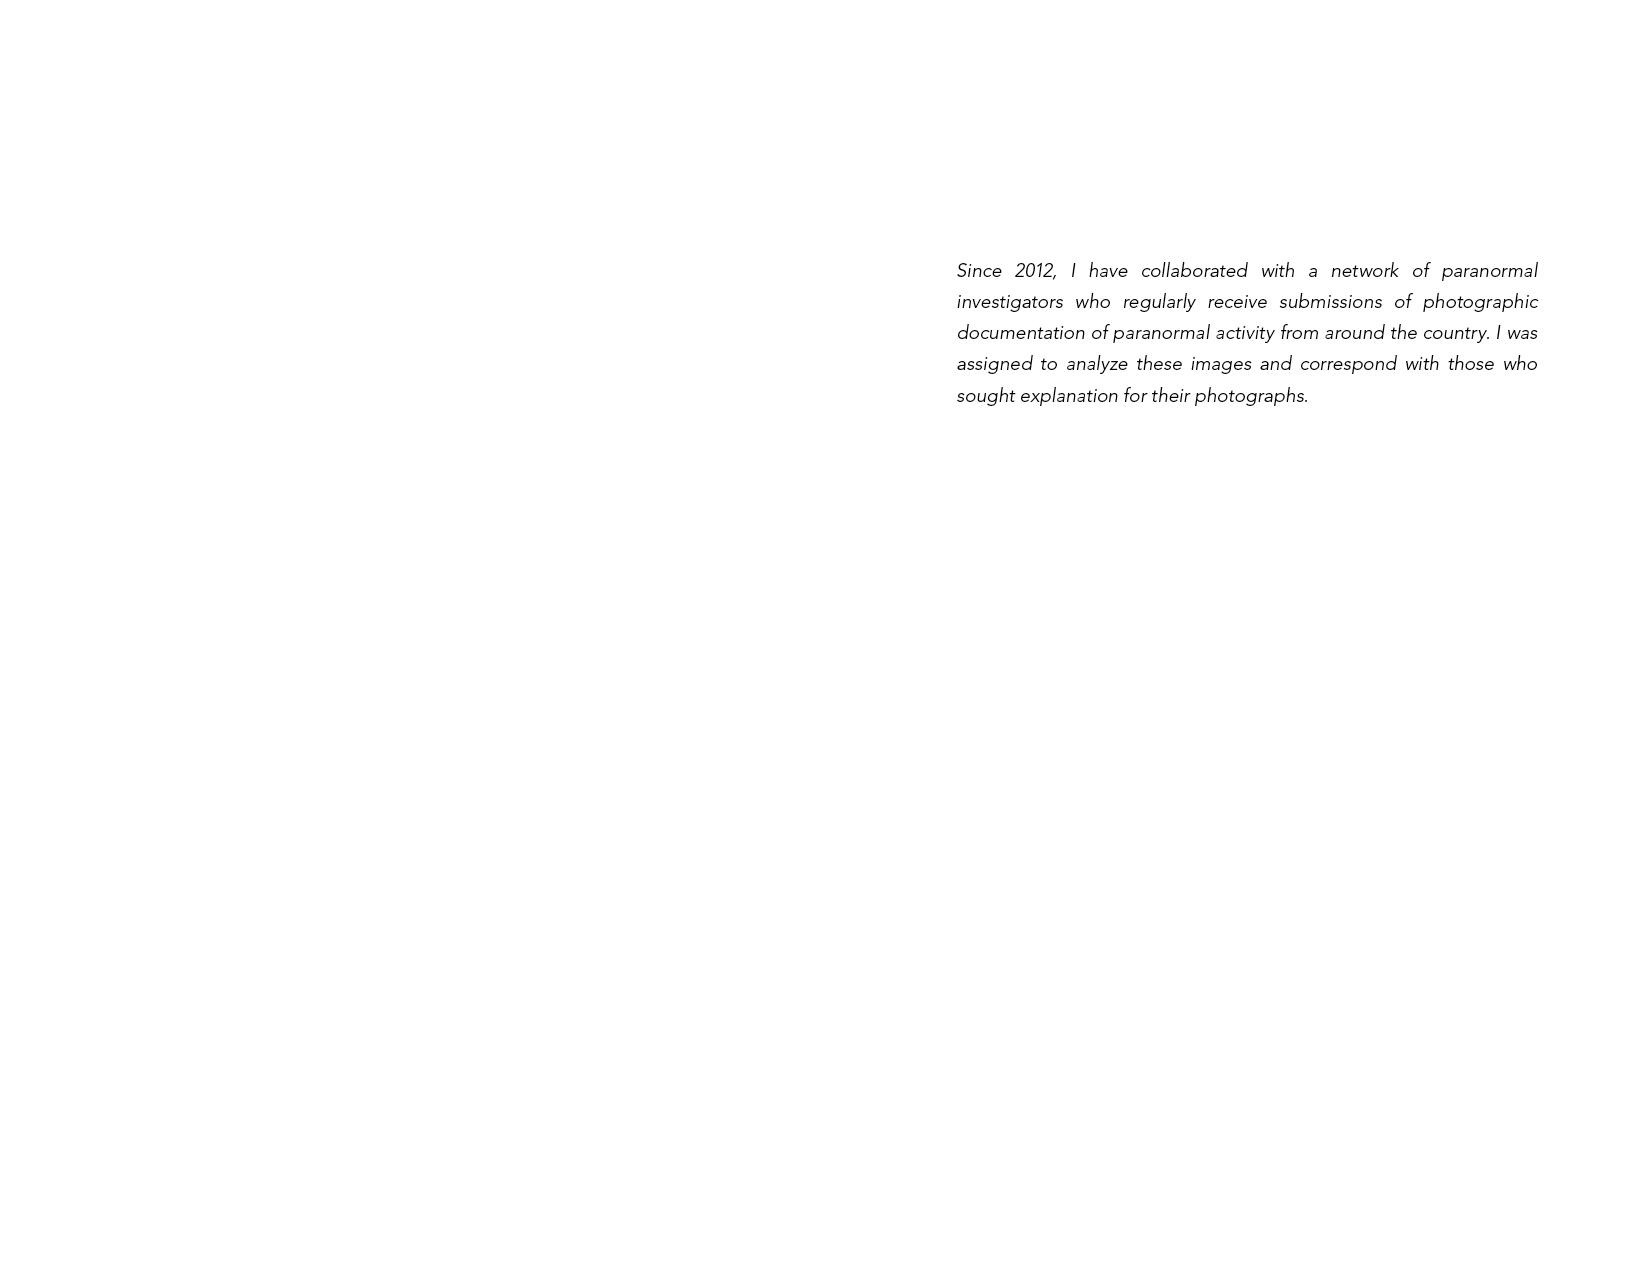 ElizabethMoran_Correspondence1_pages15.png